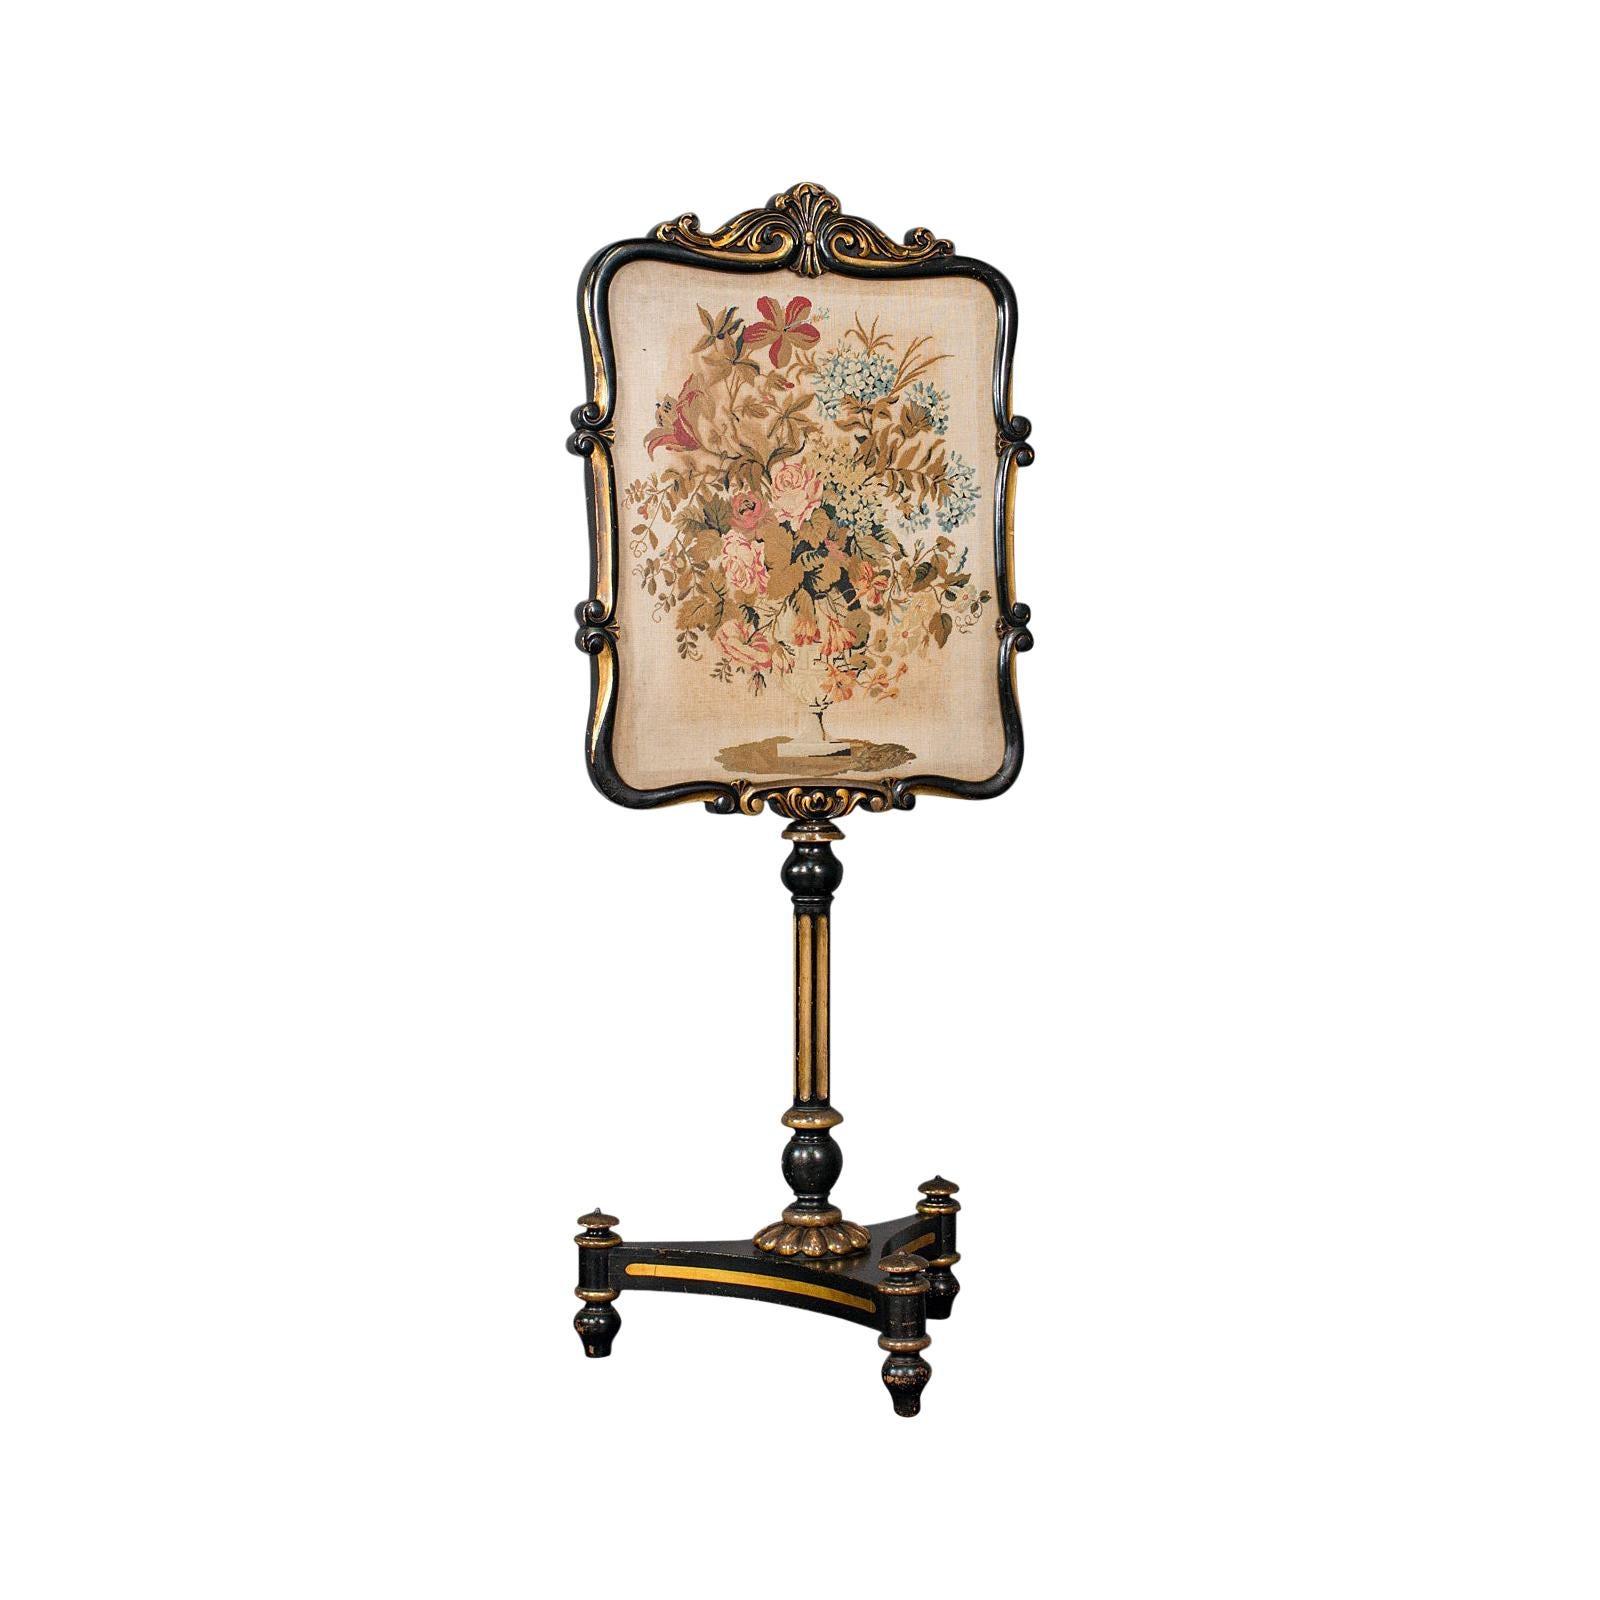 Antique Fireside Screen, English, Panel, Needlepoint, Tapestry, Regency